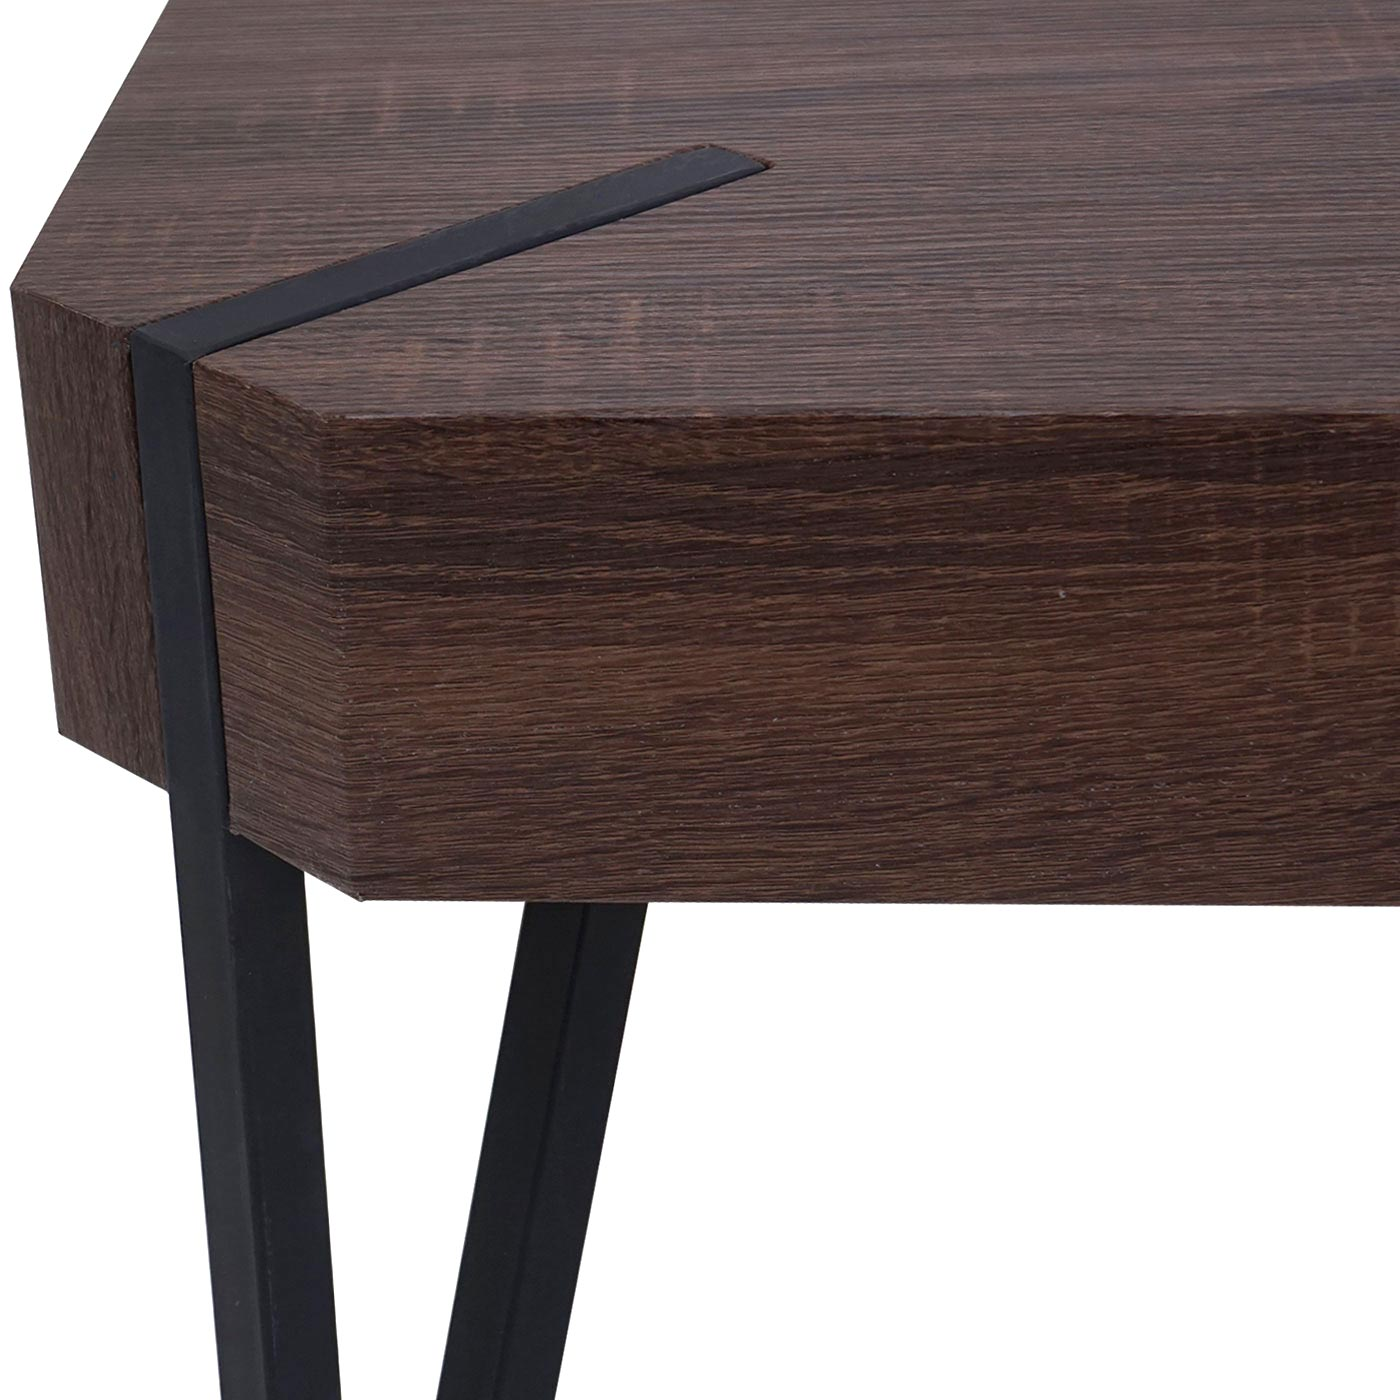 dunkle couchtische fabulous couchtisch indigo bei pocode with dunkle couchtische free. Black Bedroom Furniture Sets. Home Design Ideas